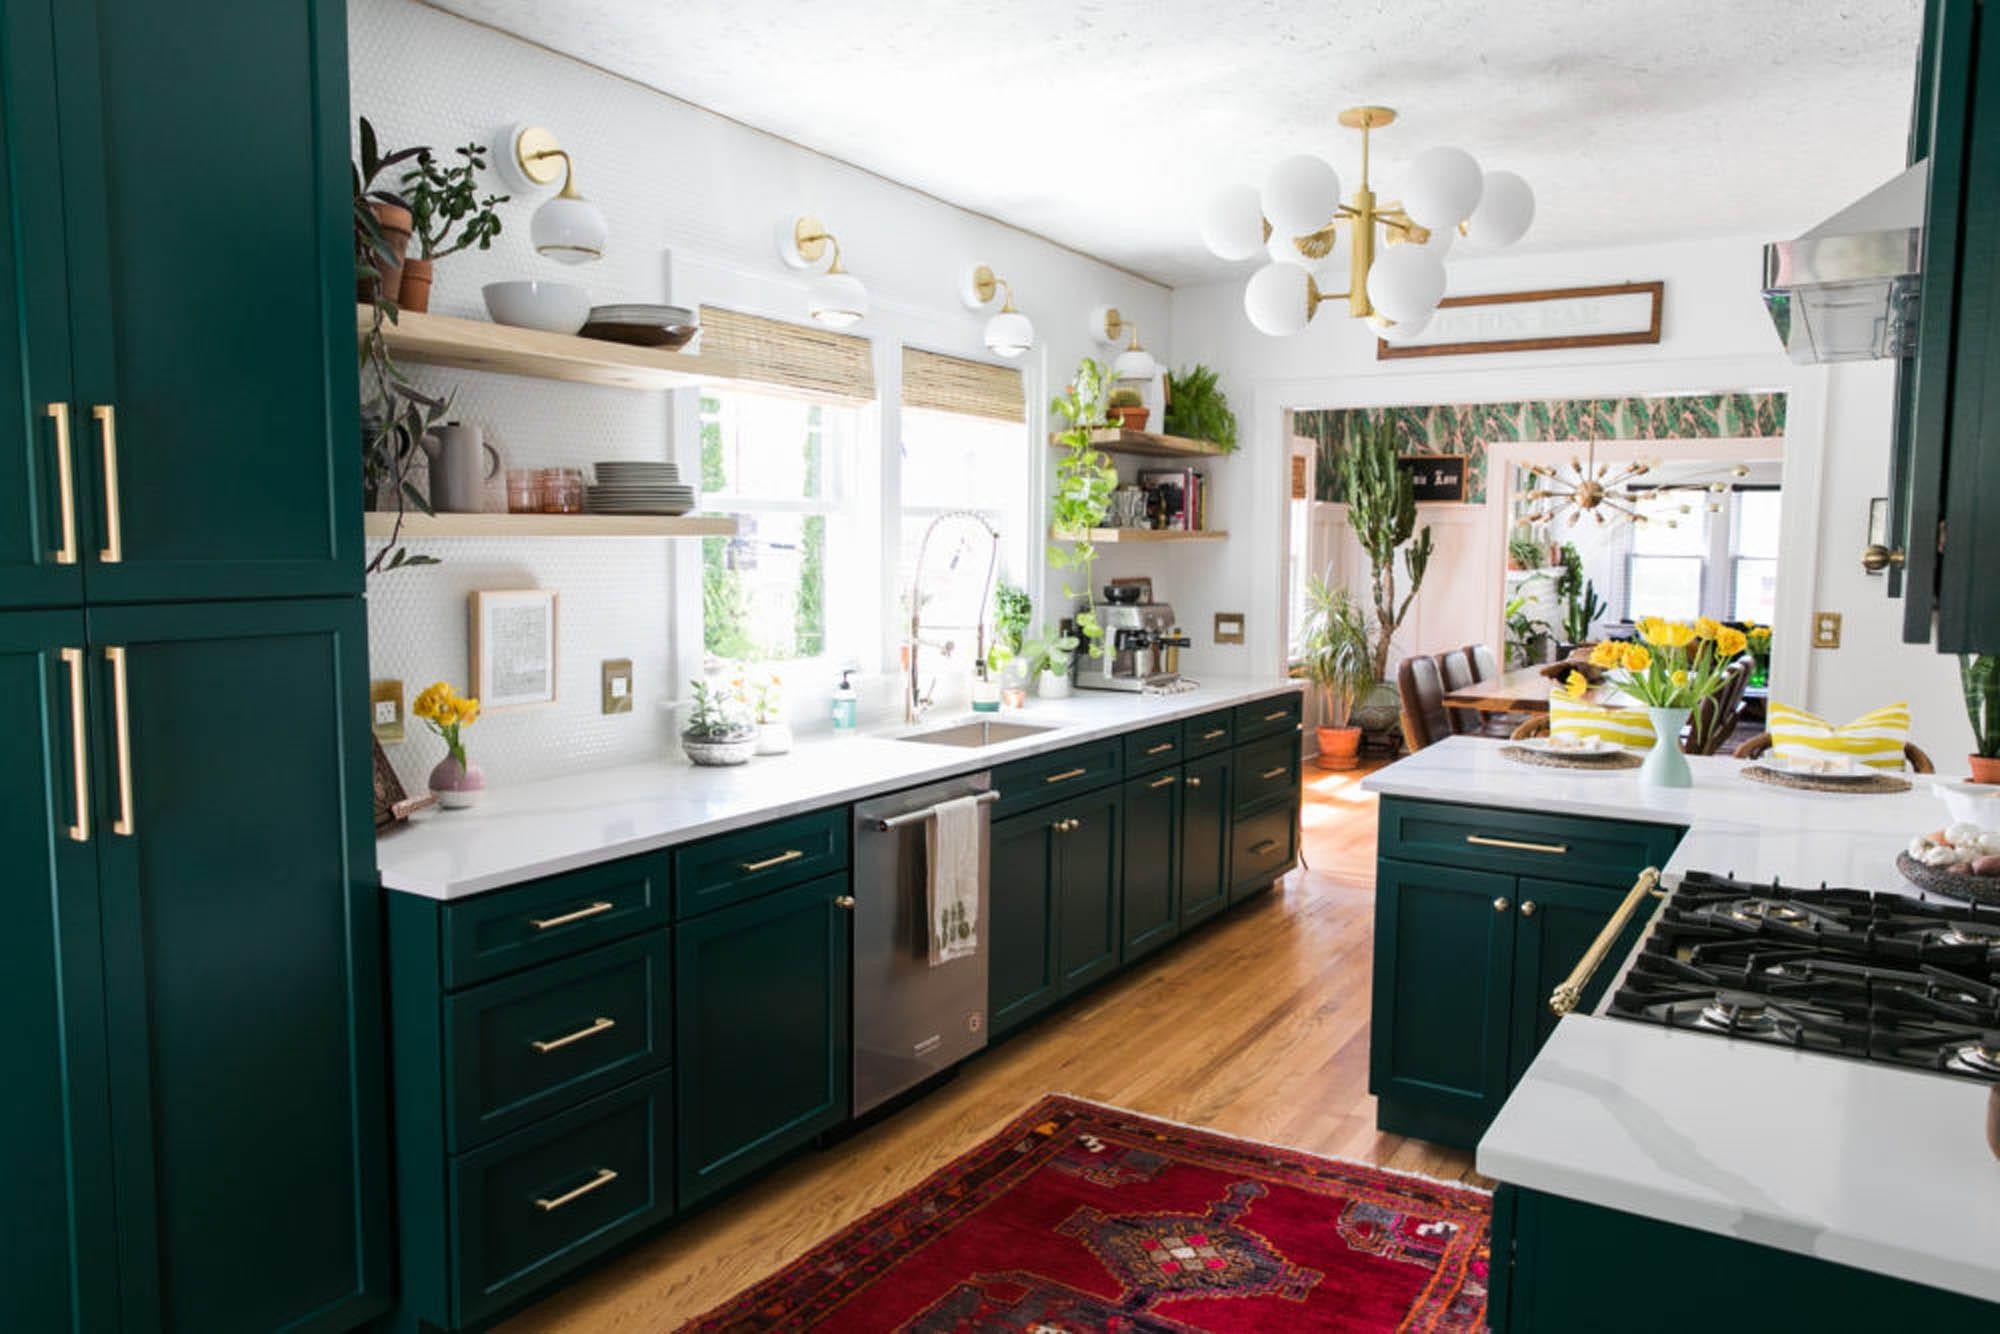 Penny round kitchen backsplash tile